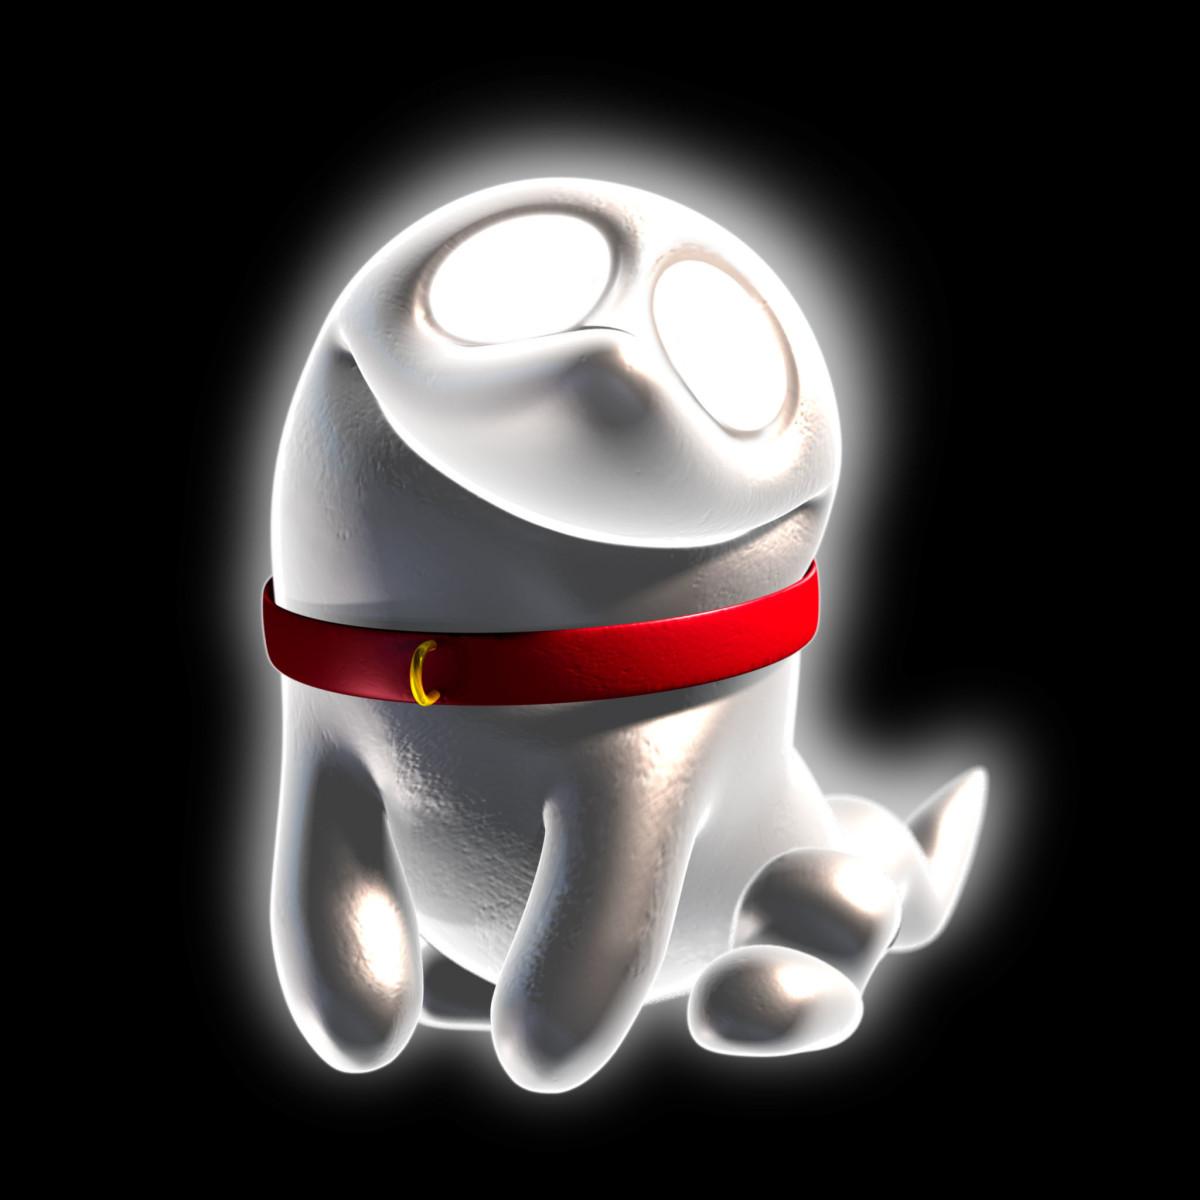 From Luigi's Mansion Dark Moon